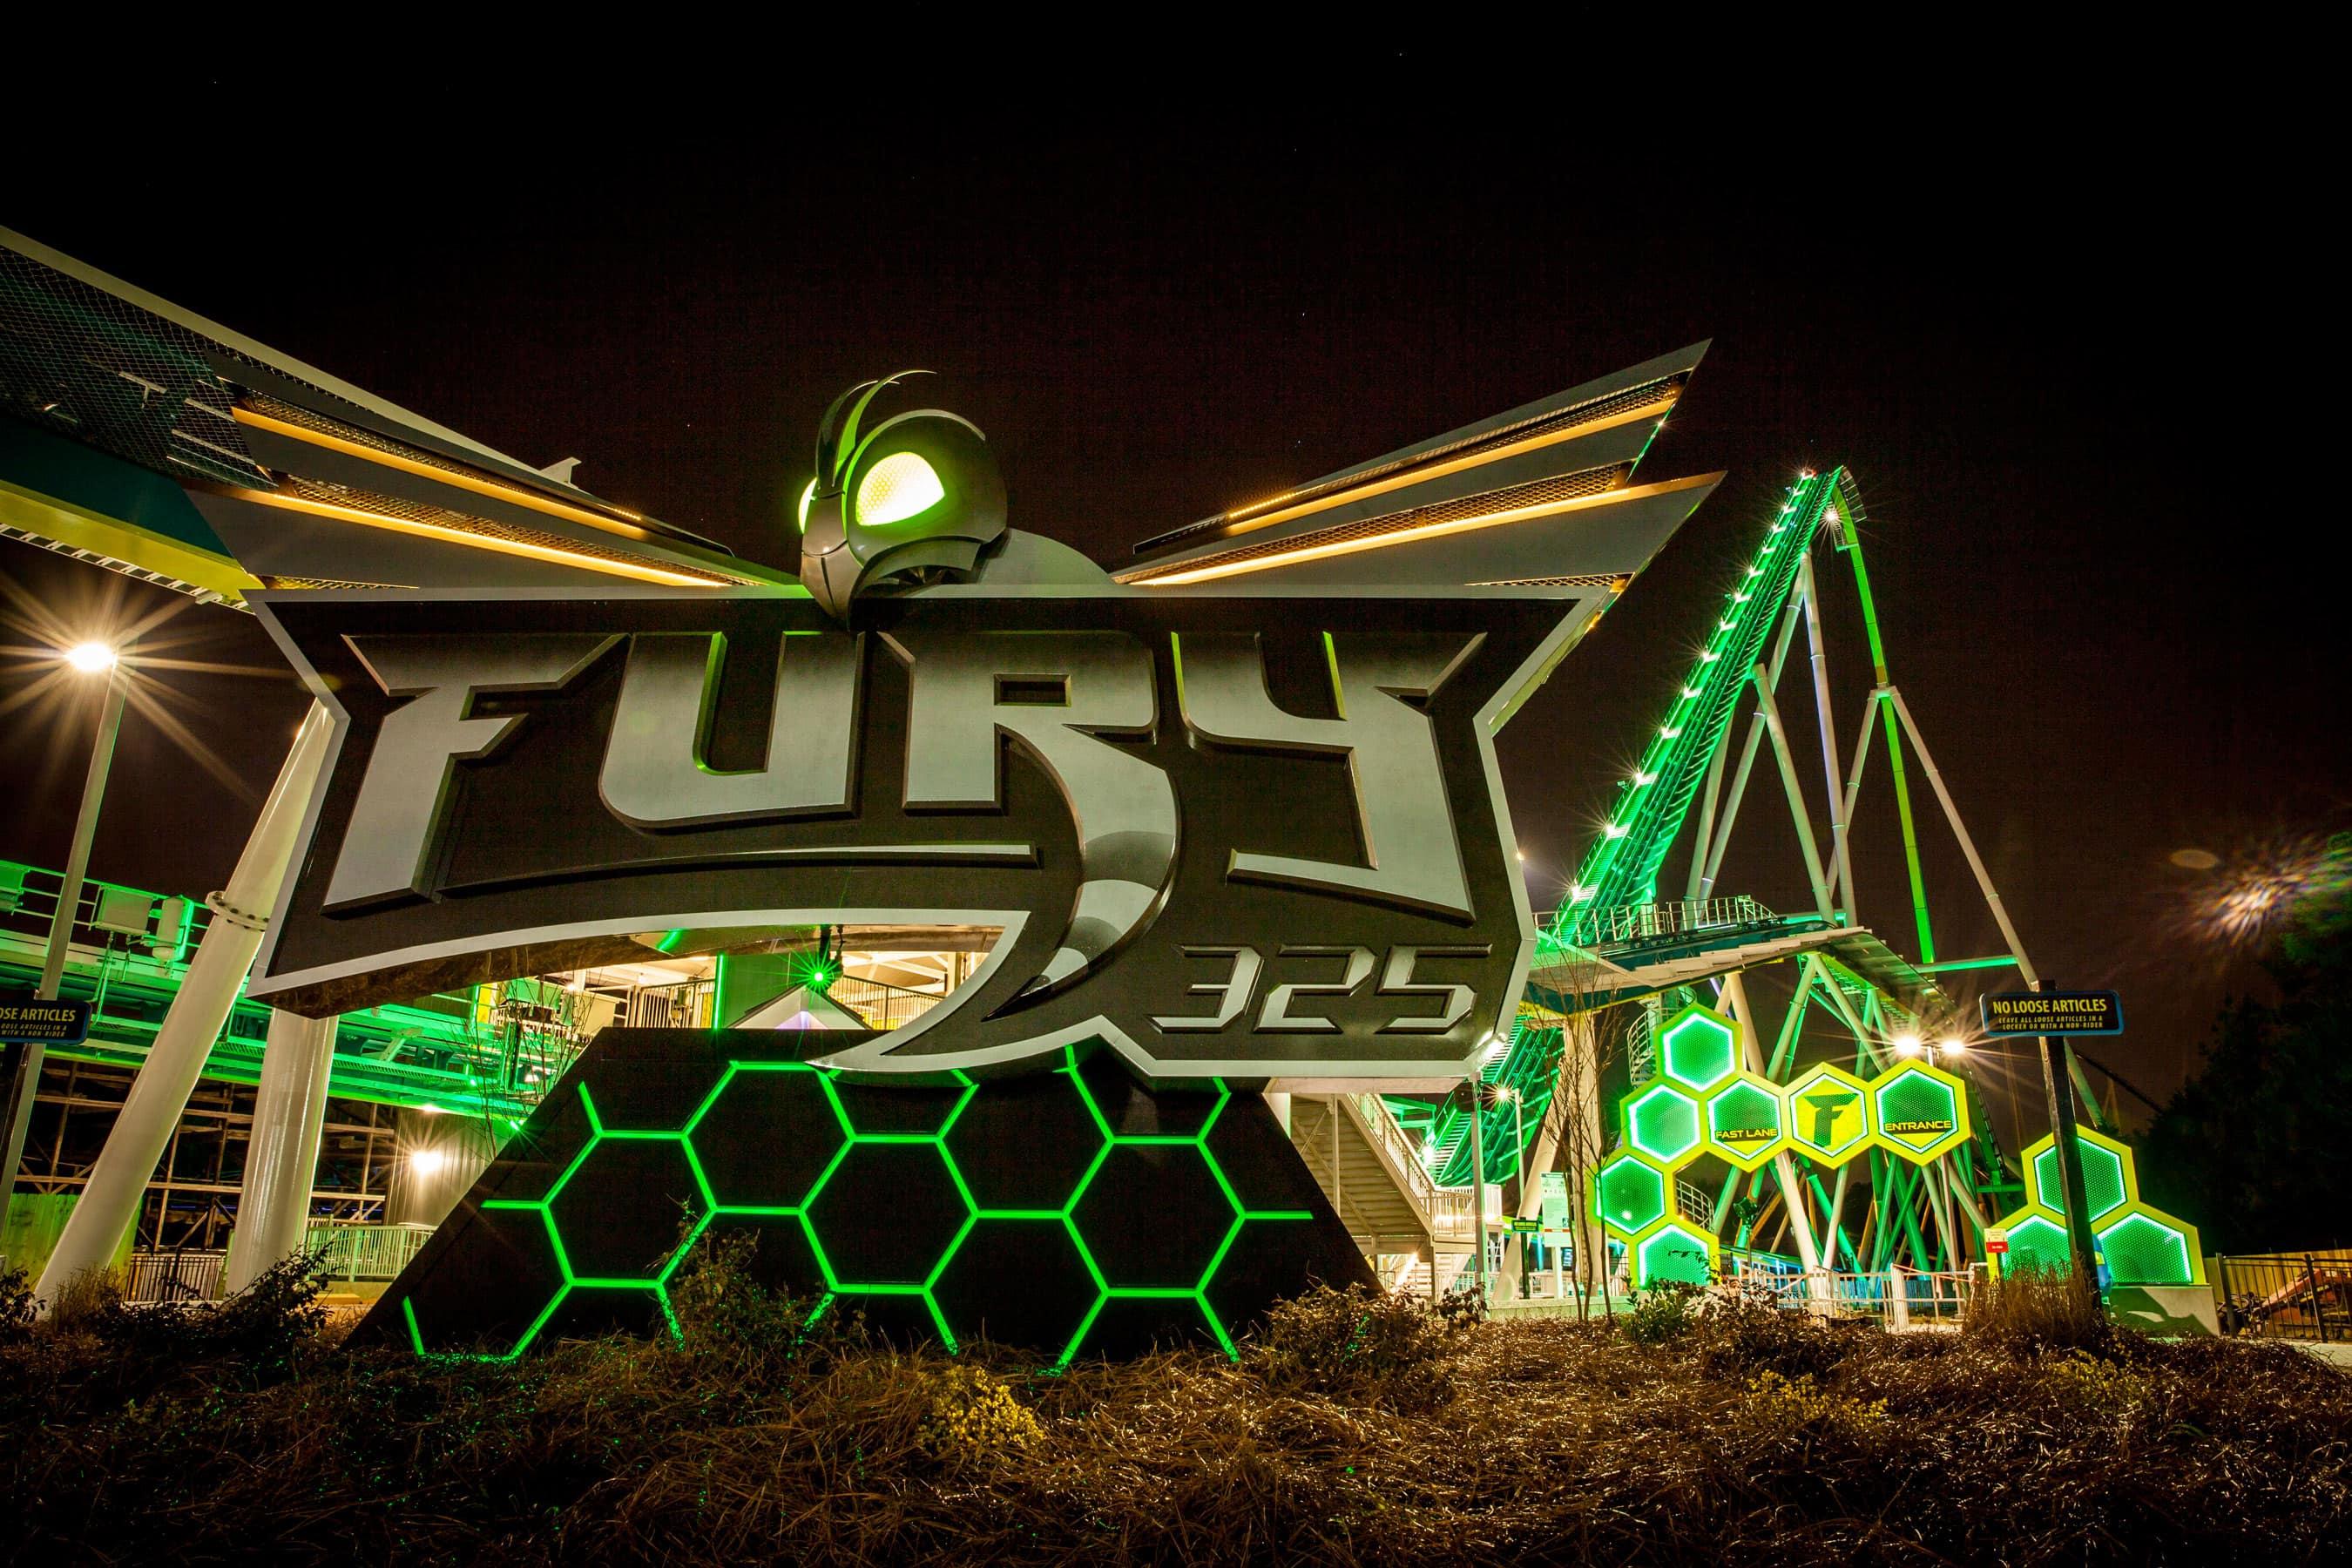 FURY 325 Set To Debut At Carowinds Amusement Park